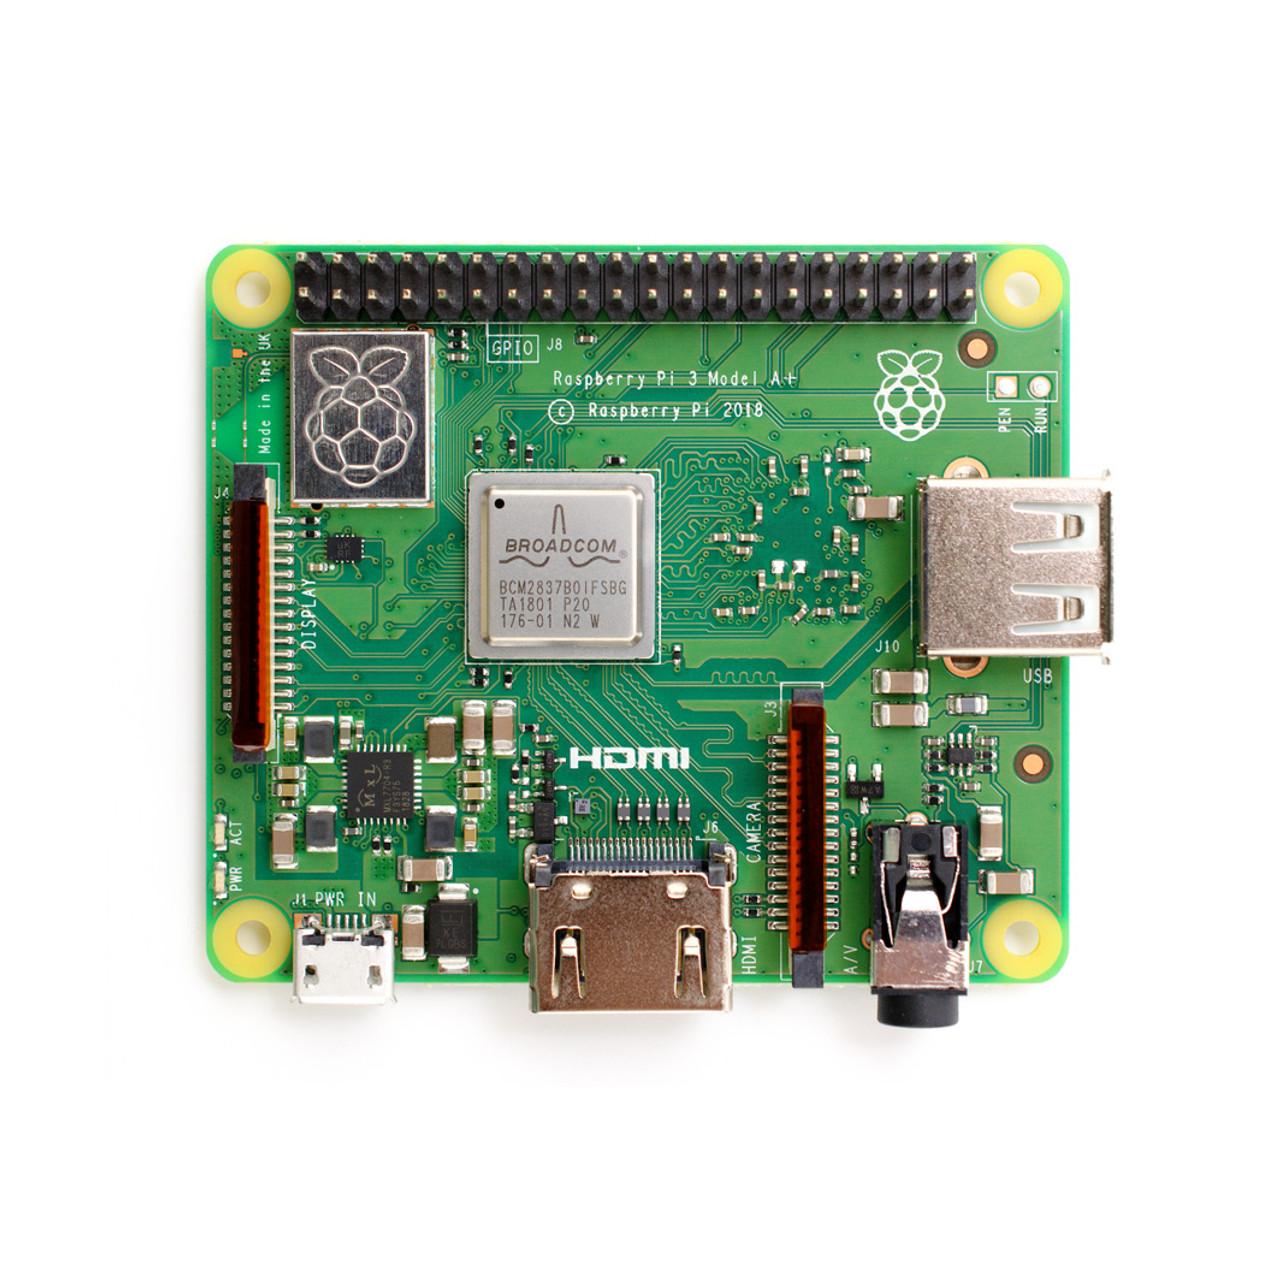 Raspberry Pi 3 - Model A+ (PLUS) - LATEST